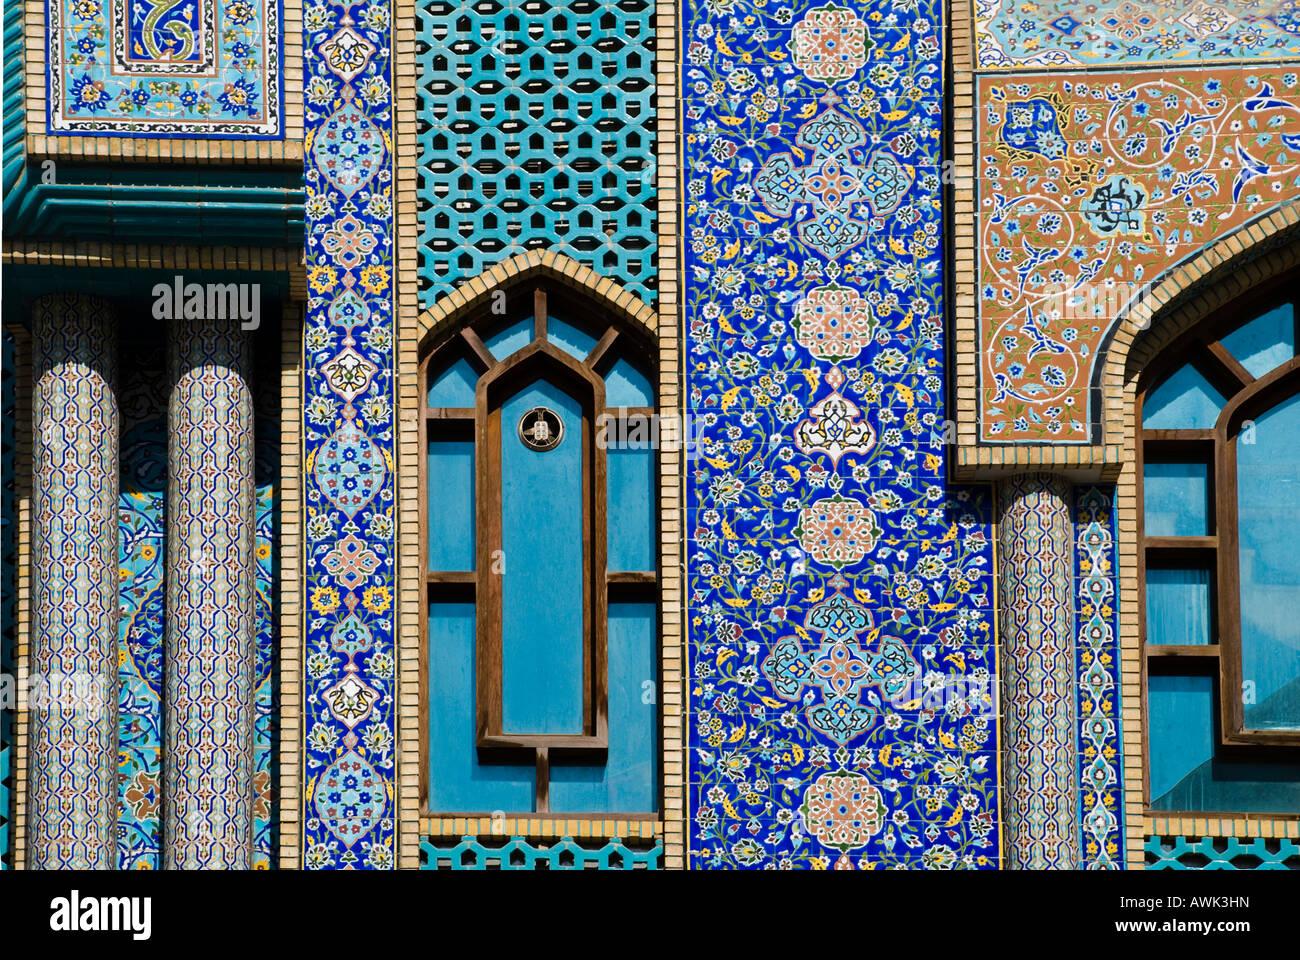 ... Photo - Persian tile mosiac work on the Iranian Mosque in Dubai UAE